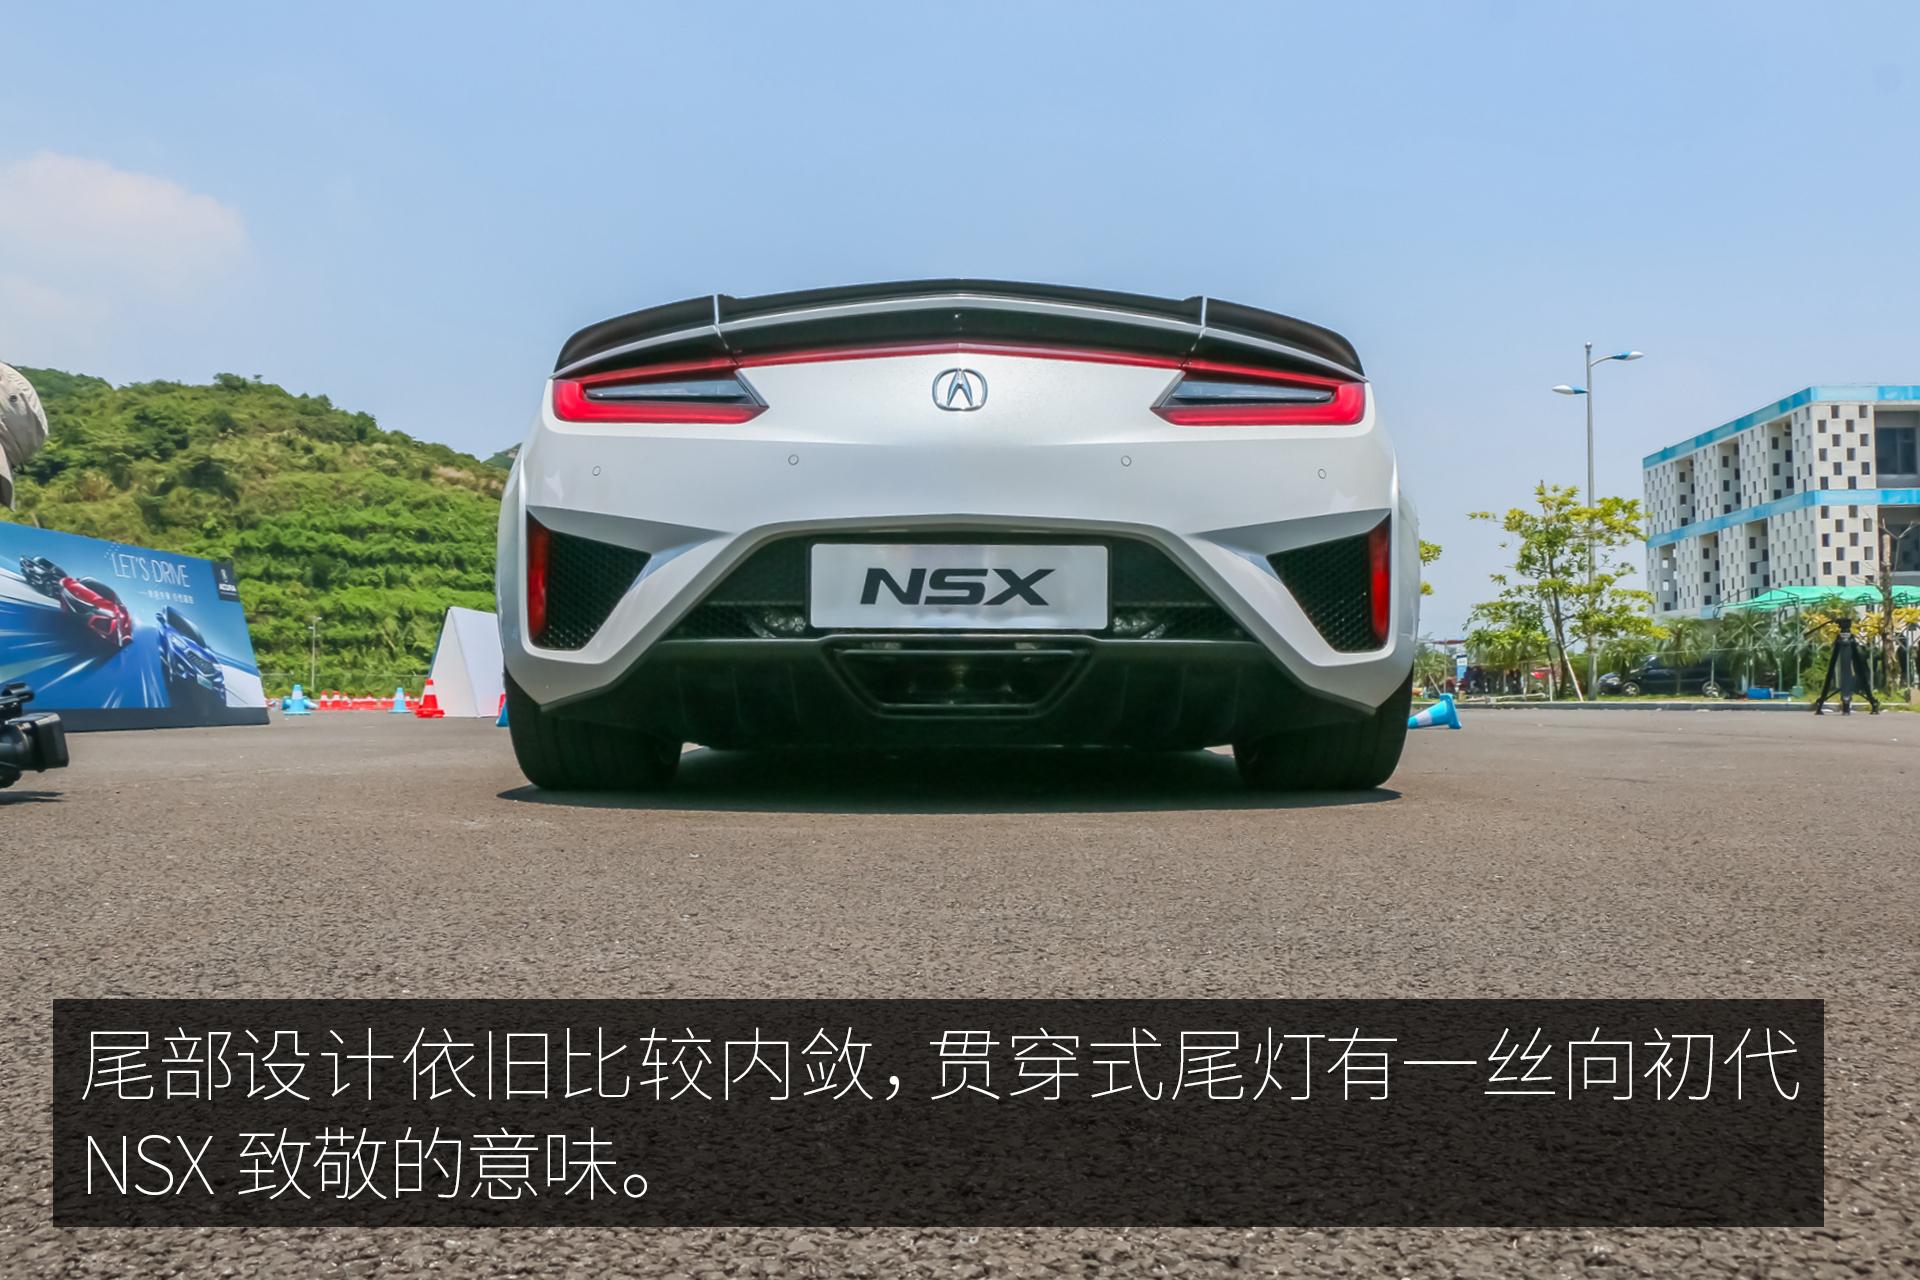 NSX尾灯-1.jpg